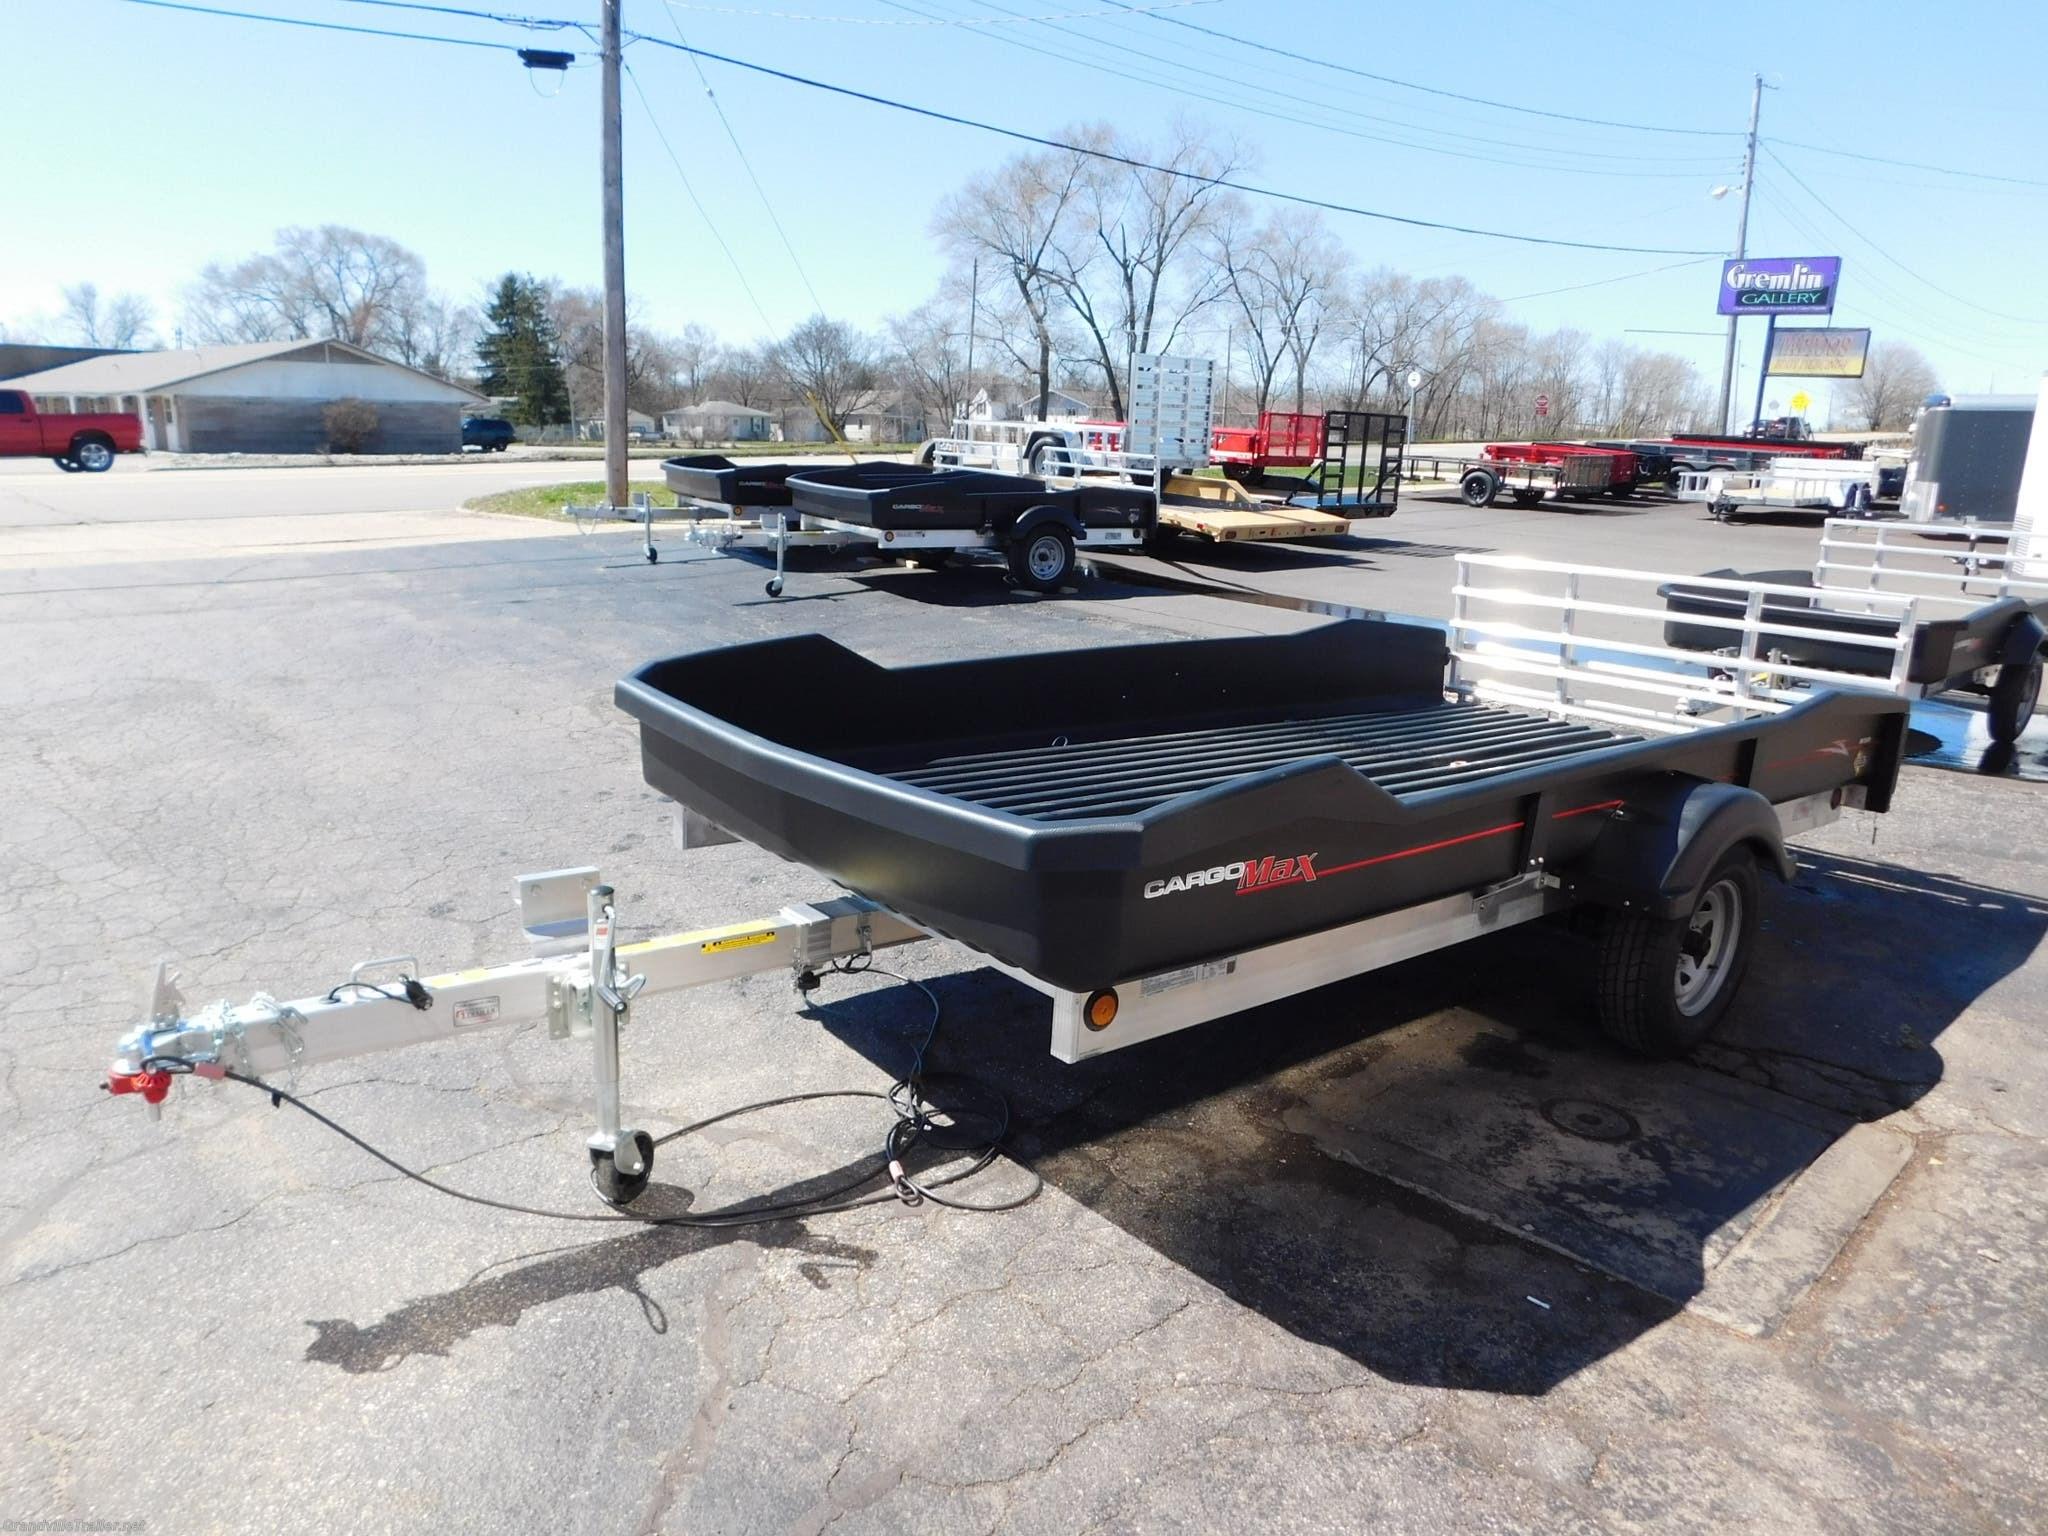 2886 - 2019 FLOE XRT 13-73 for sale in Grandville MI Floe Trailer Wiring Harness on trailer hitch harness, trailer plugs, trailer fuses, trailer generator, trailer brakes, trailer mounting brackets,